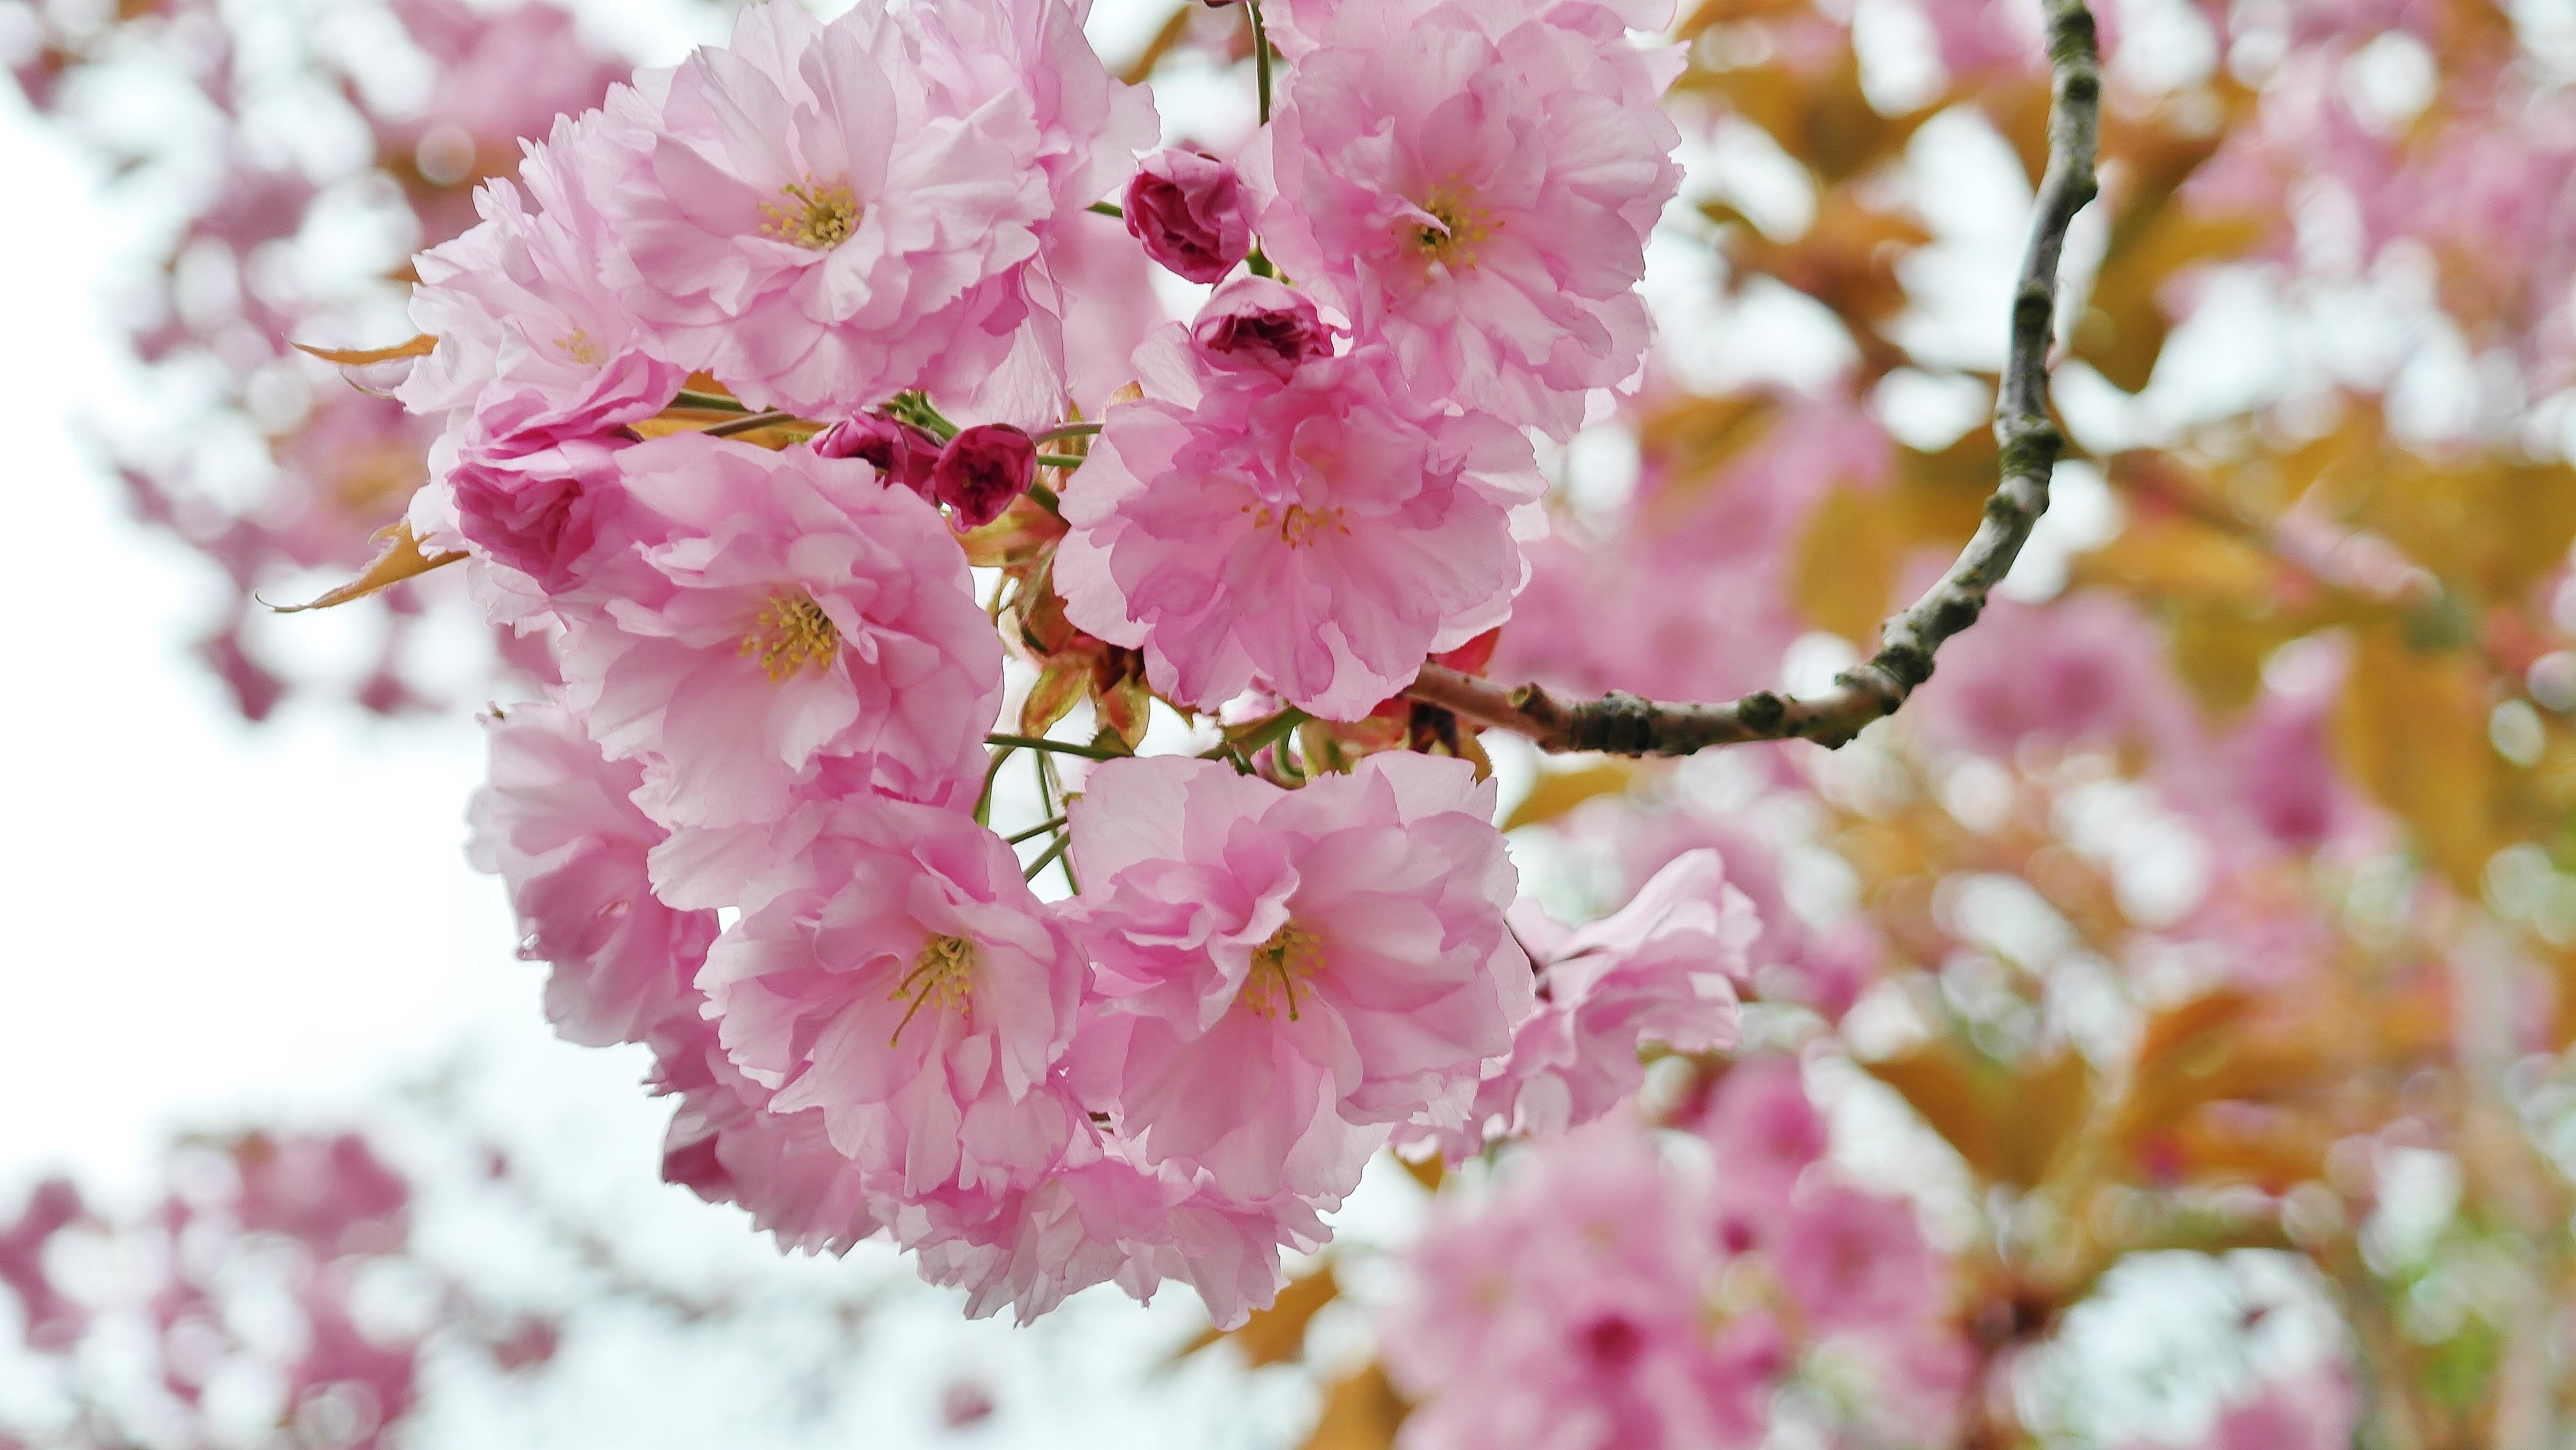 Free Images Nature Branch Sky Petal Rose Food Spring